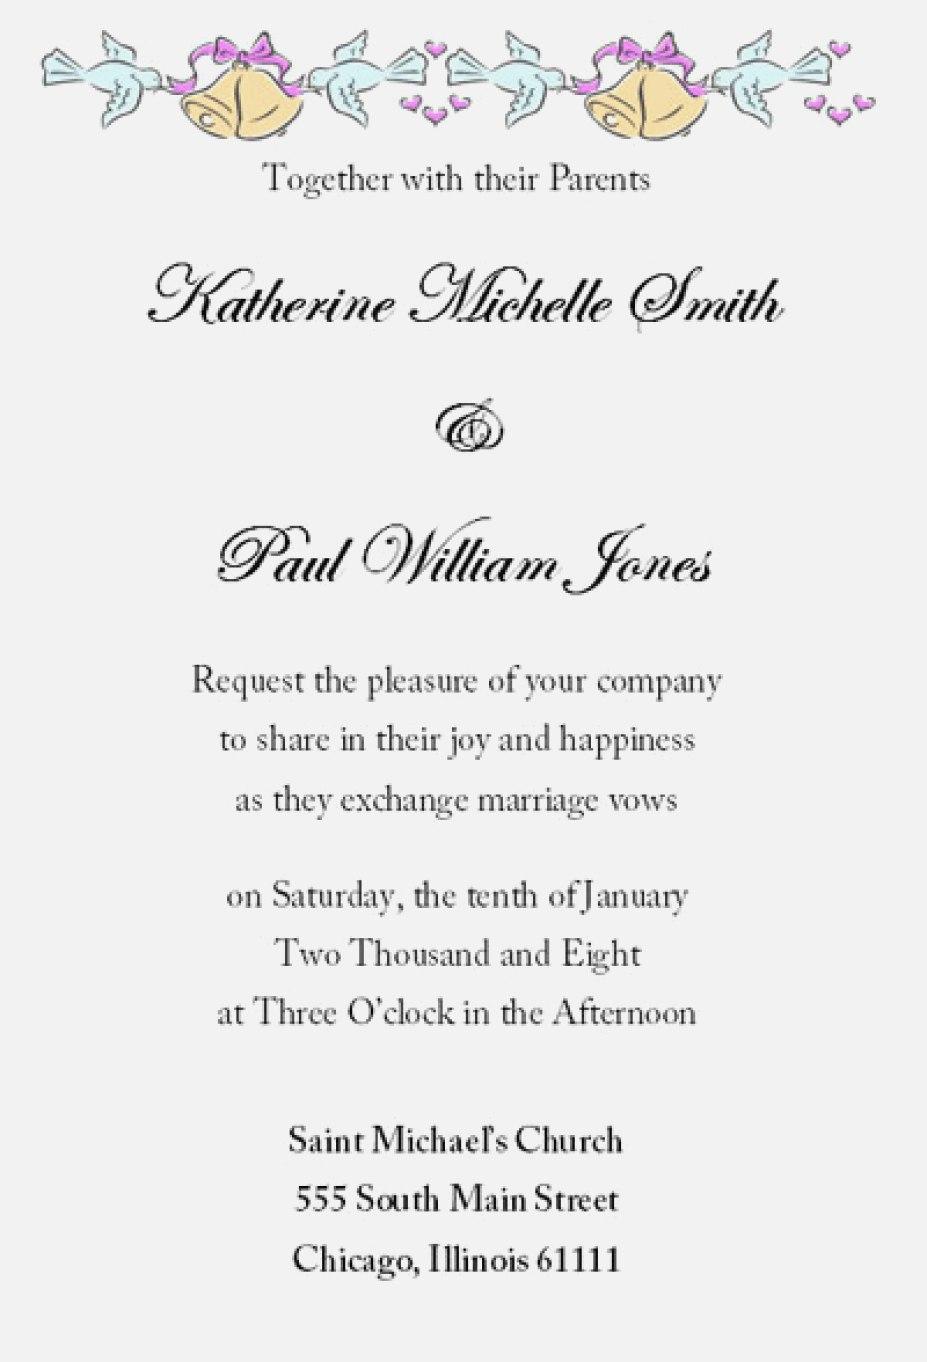 Marriage Invitation Letter New Model Invitation Templates Free Fun Wedding Invitations Wedding Invitation Verses Wedding Invitation Samples